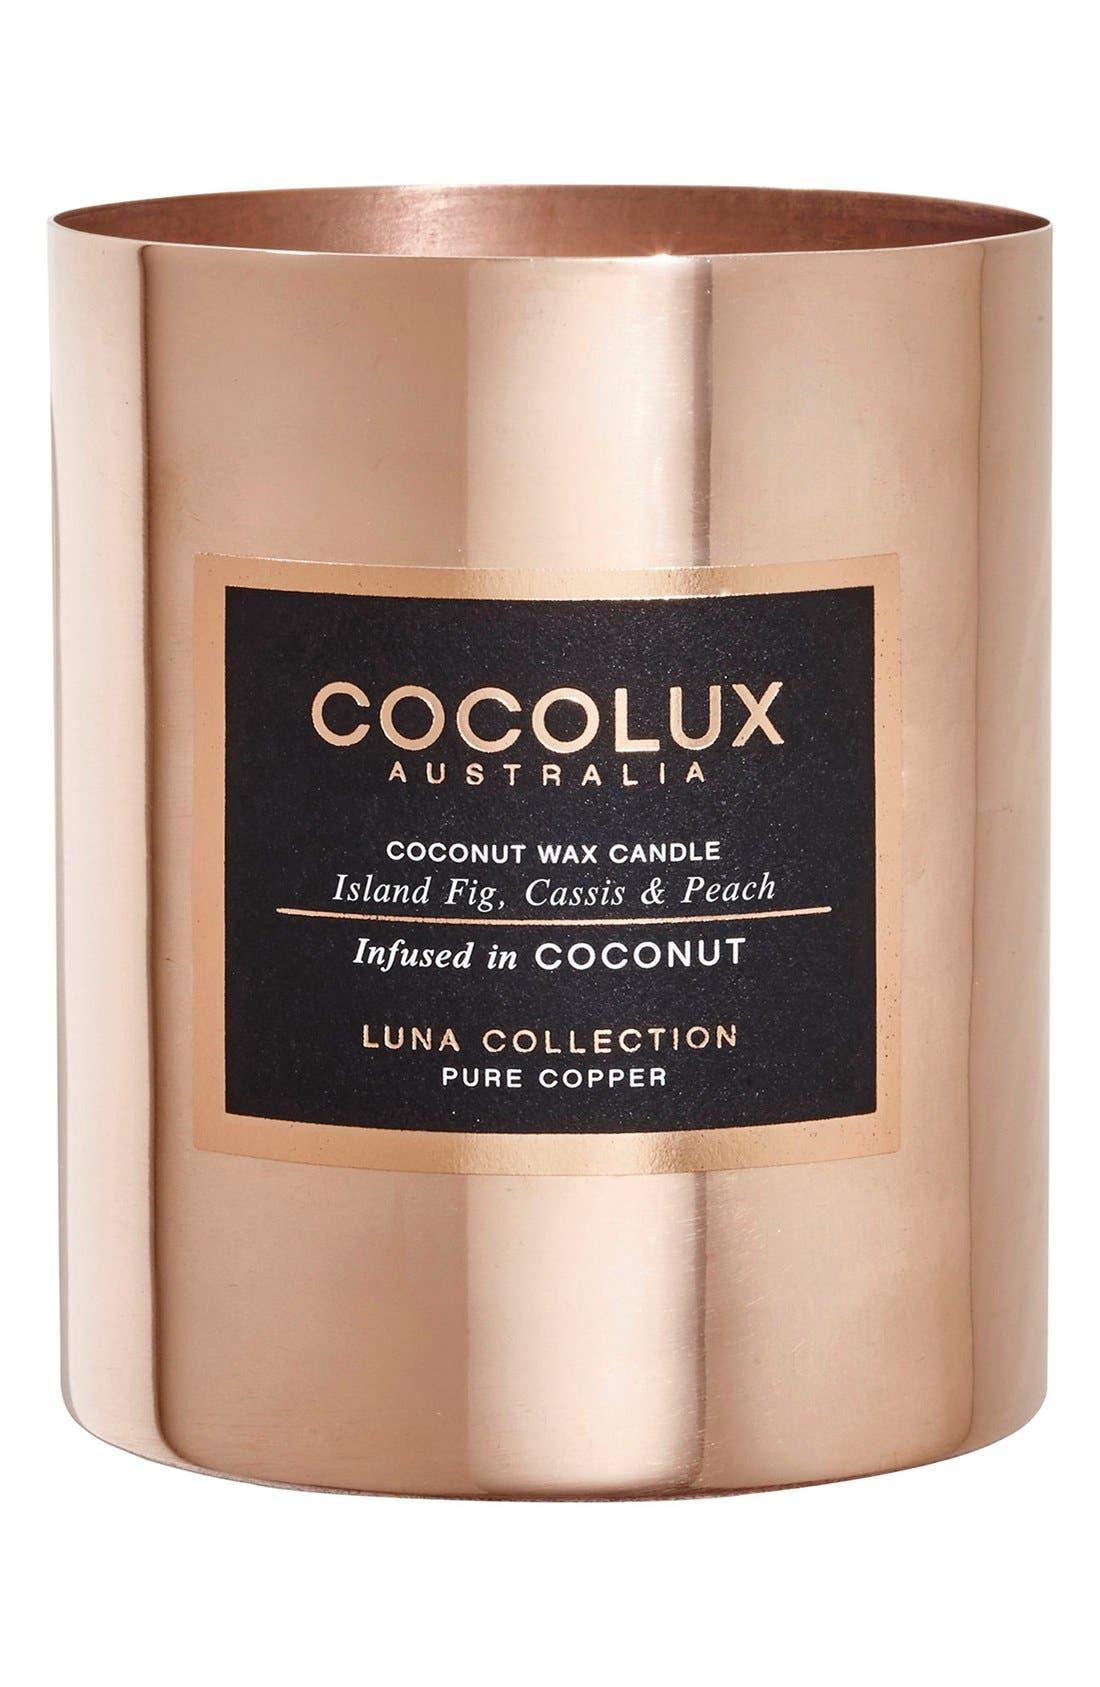 Cocolux Australia Island Fig, Cassis & Peach Copper Candle